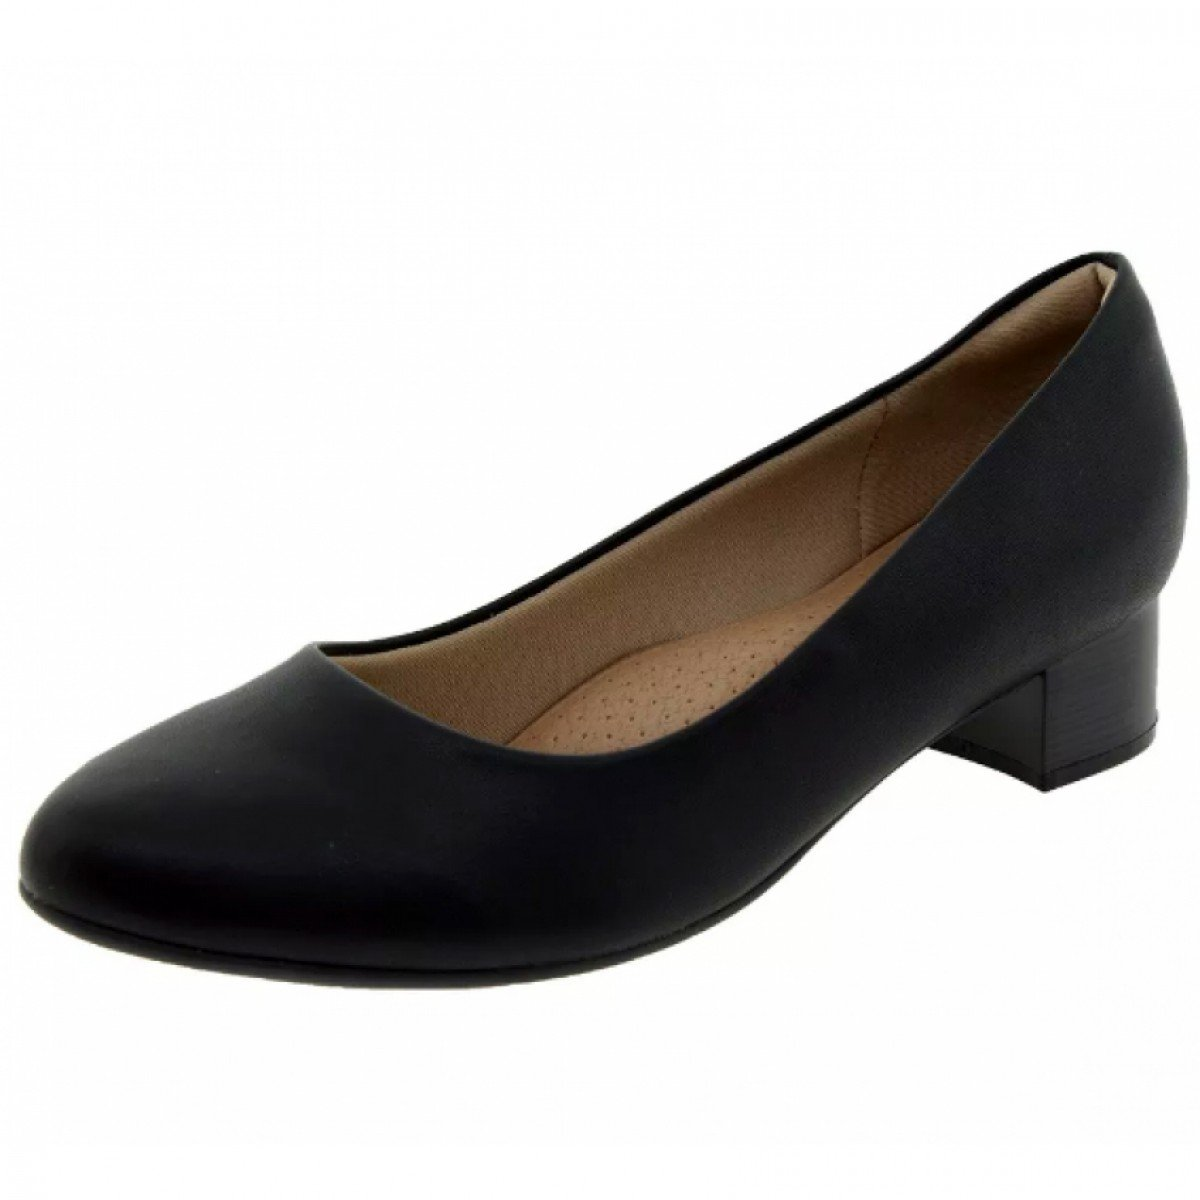 c8b8090bd Sapato Feminino Piccadilly Alarm Free Forrado - Compre Agora |Cabana ...